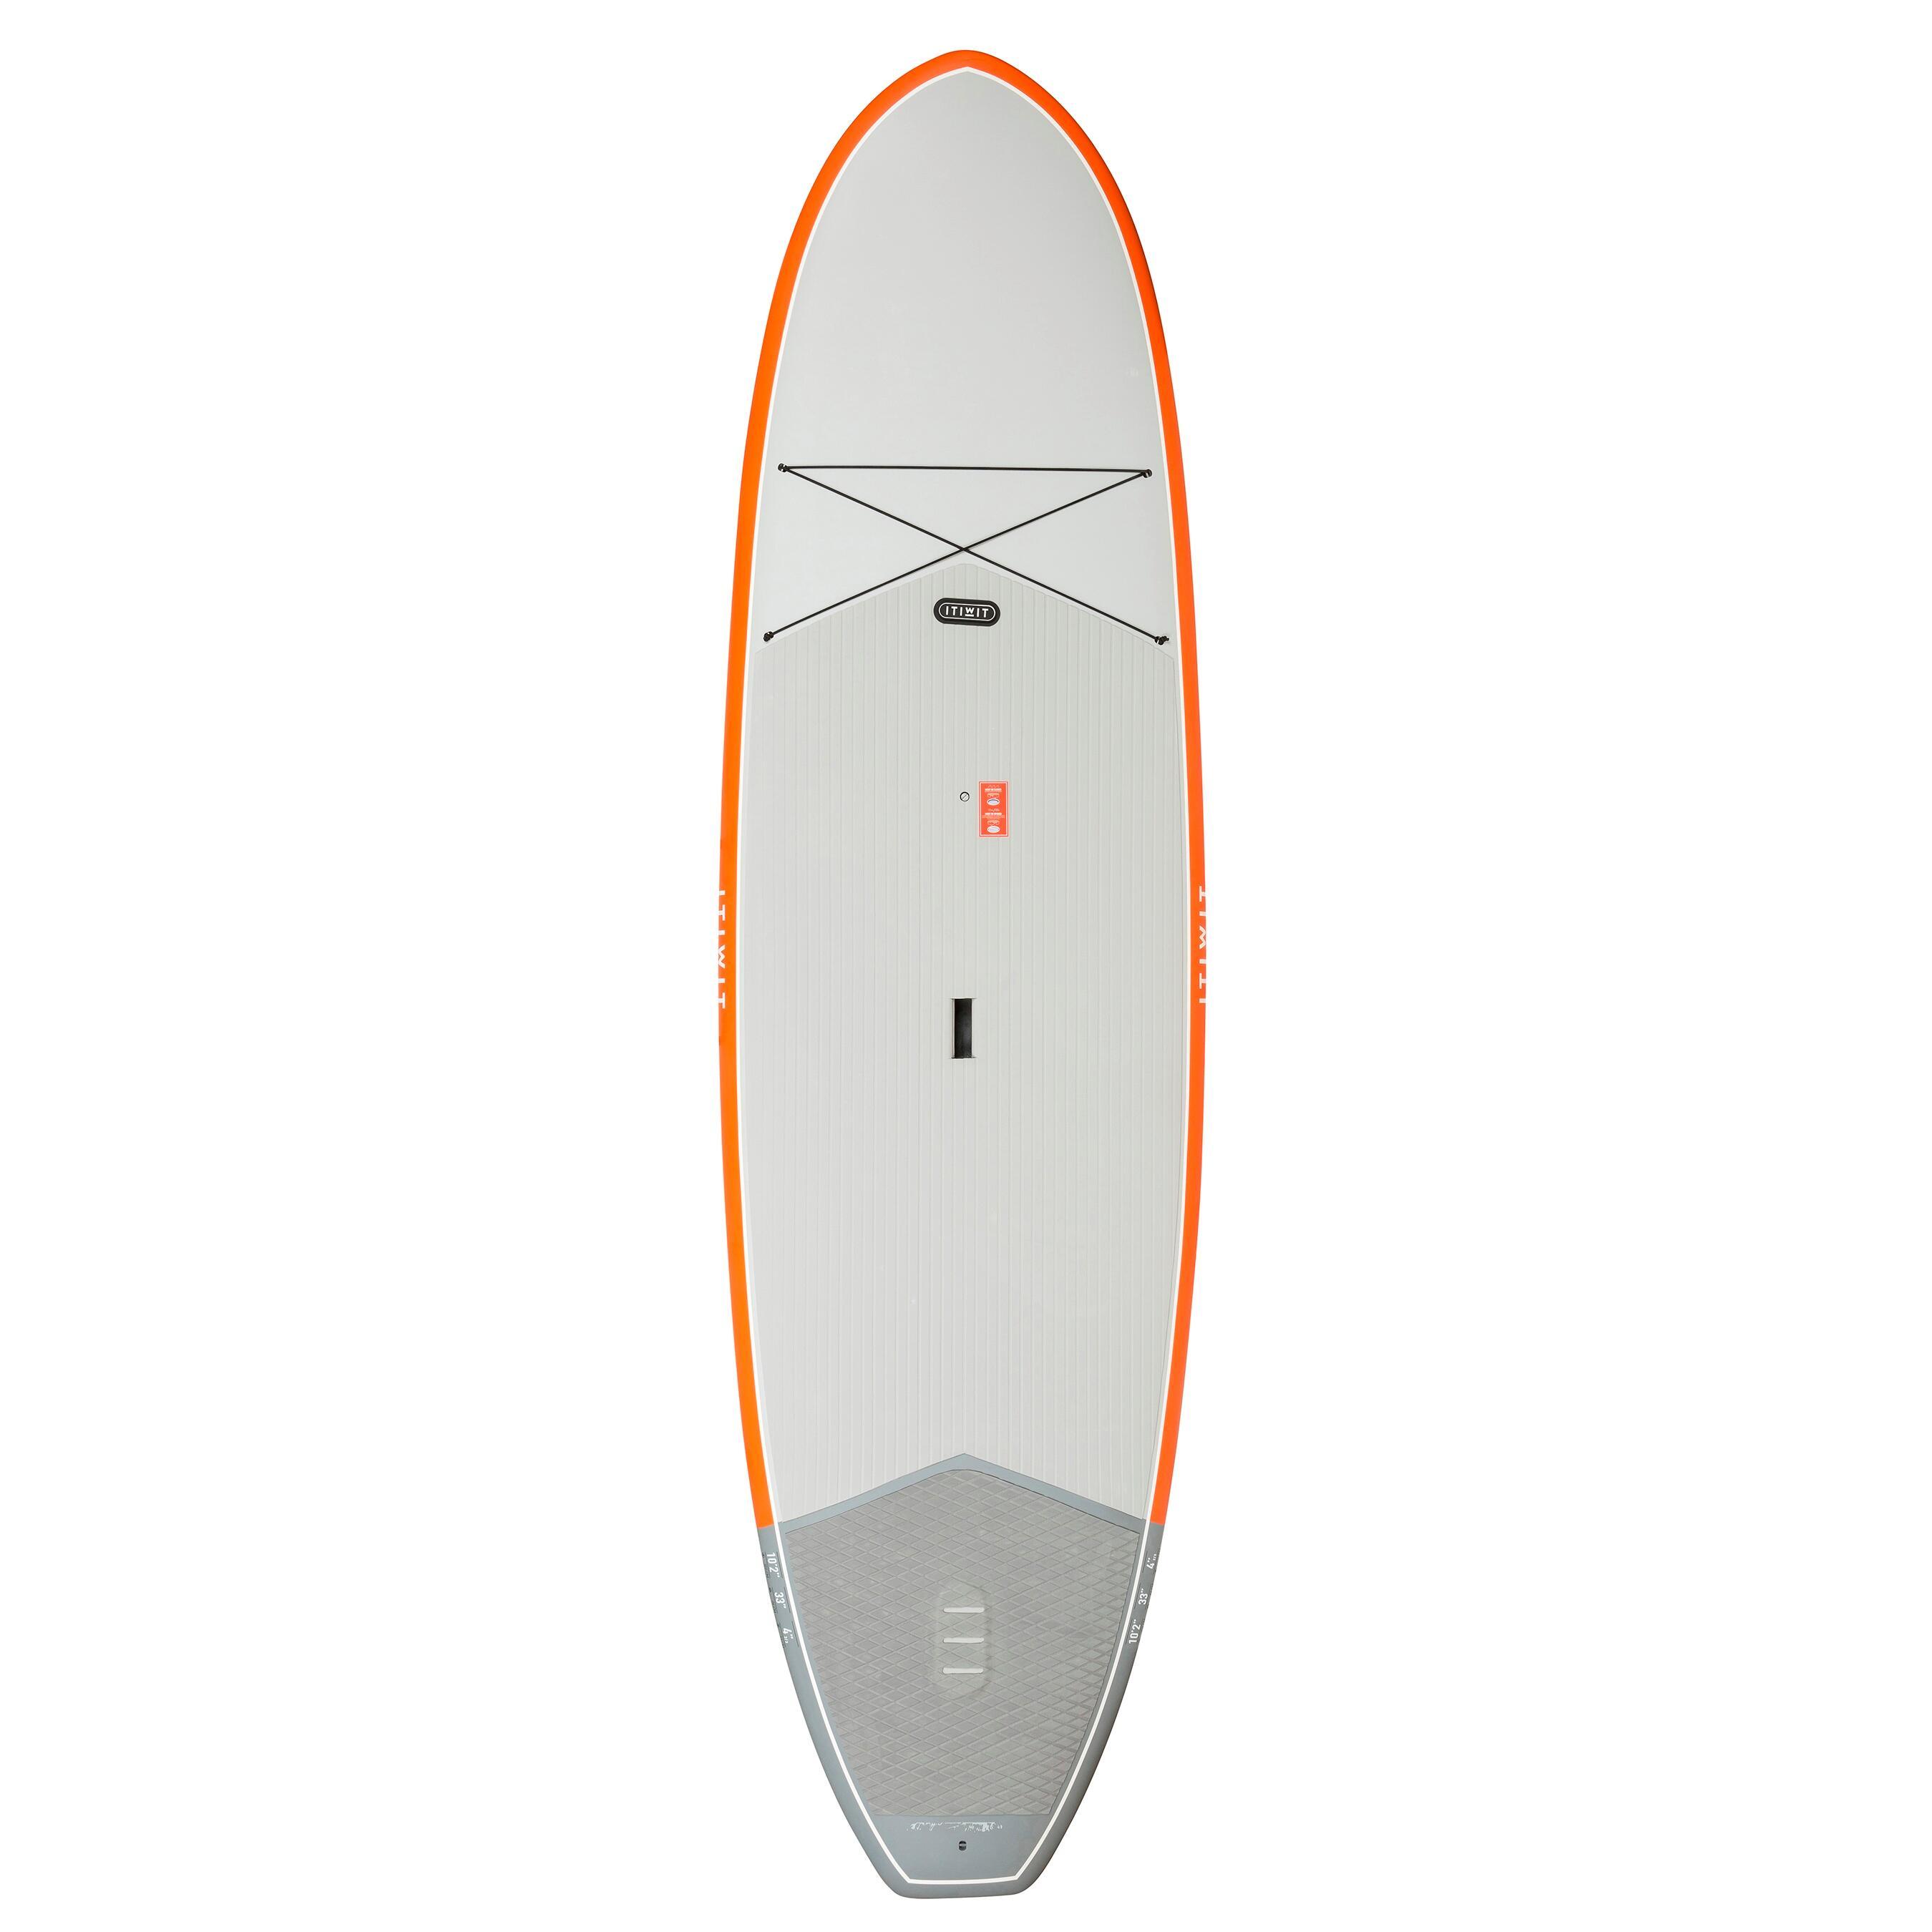 efec2e76c43 Itiwit Hard stand up paddle board voor tochten 500 10'2 oranje 200 l